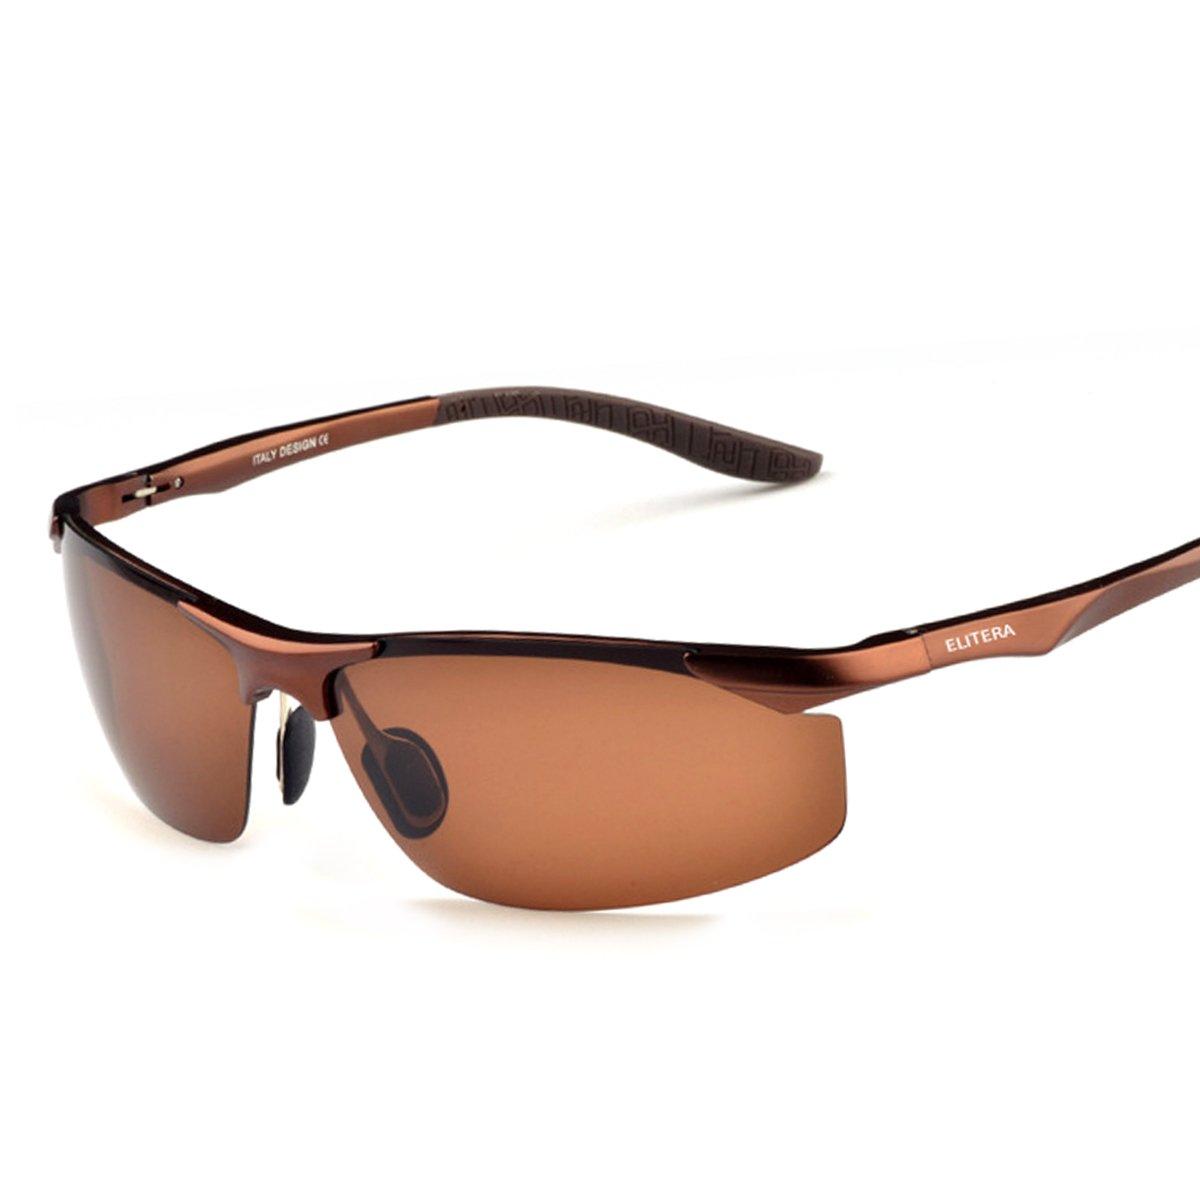 a259554b54 Amazon.com  ELITERA Aluminum Magnesium Alloy Polarized Sunglasses Mens For  Sports Driving Traval E8179 (BLACK GRAY